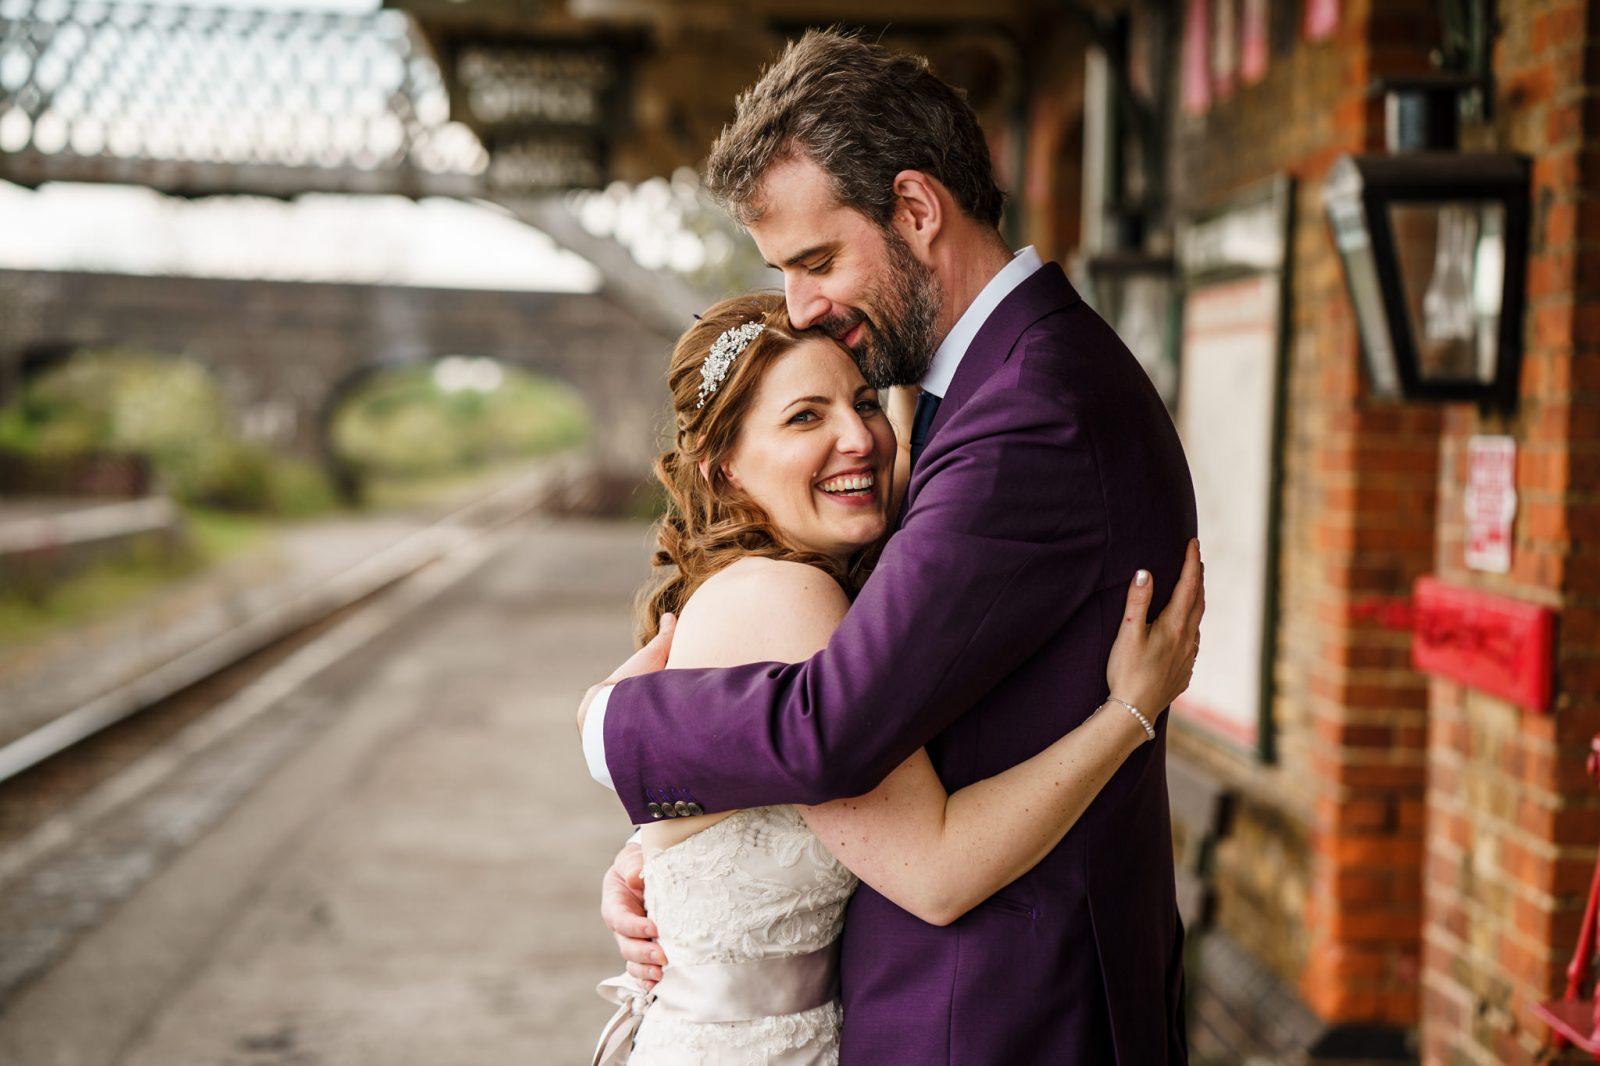 Purple-suit-groom-hugging-bride-train-station